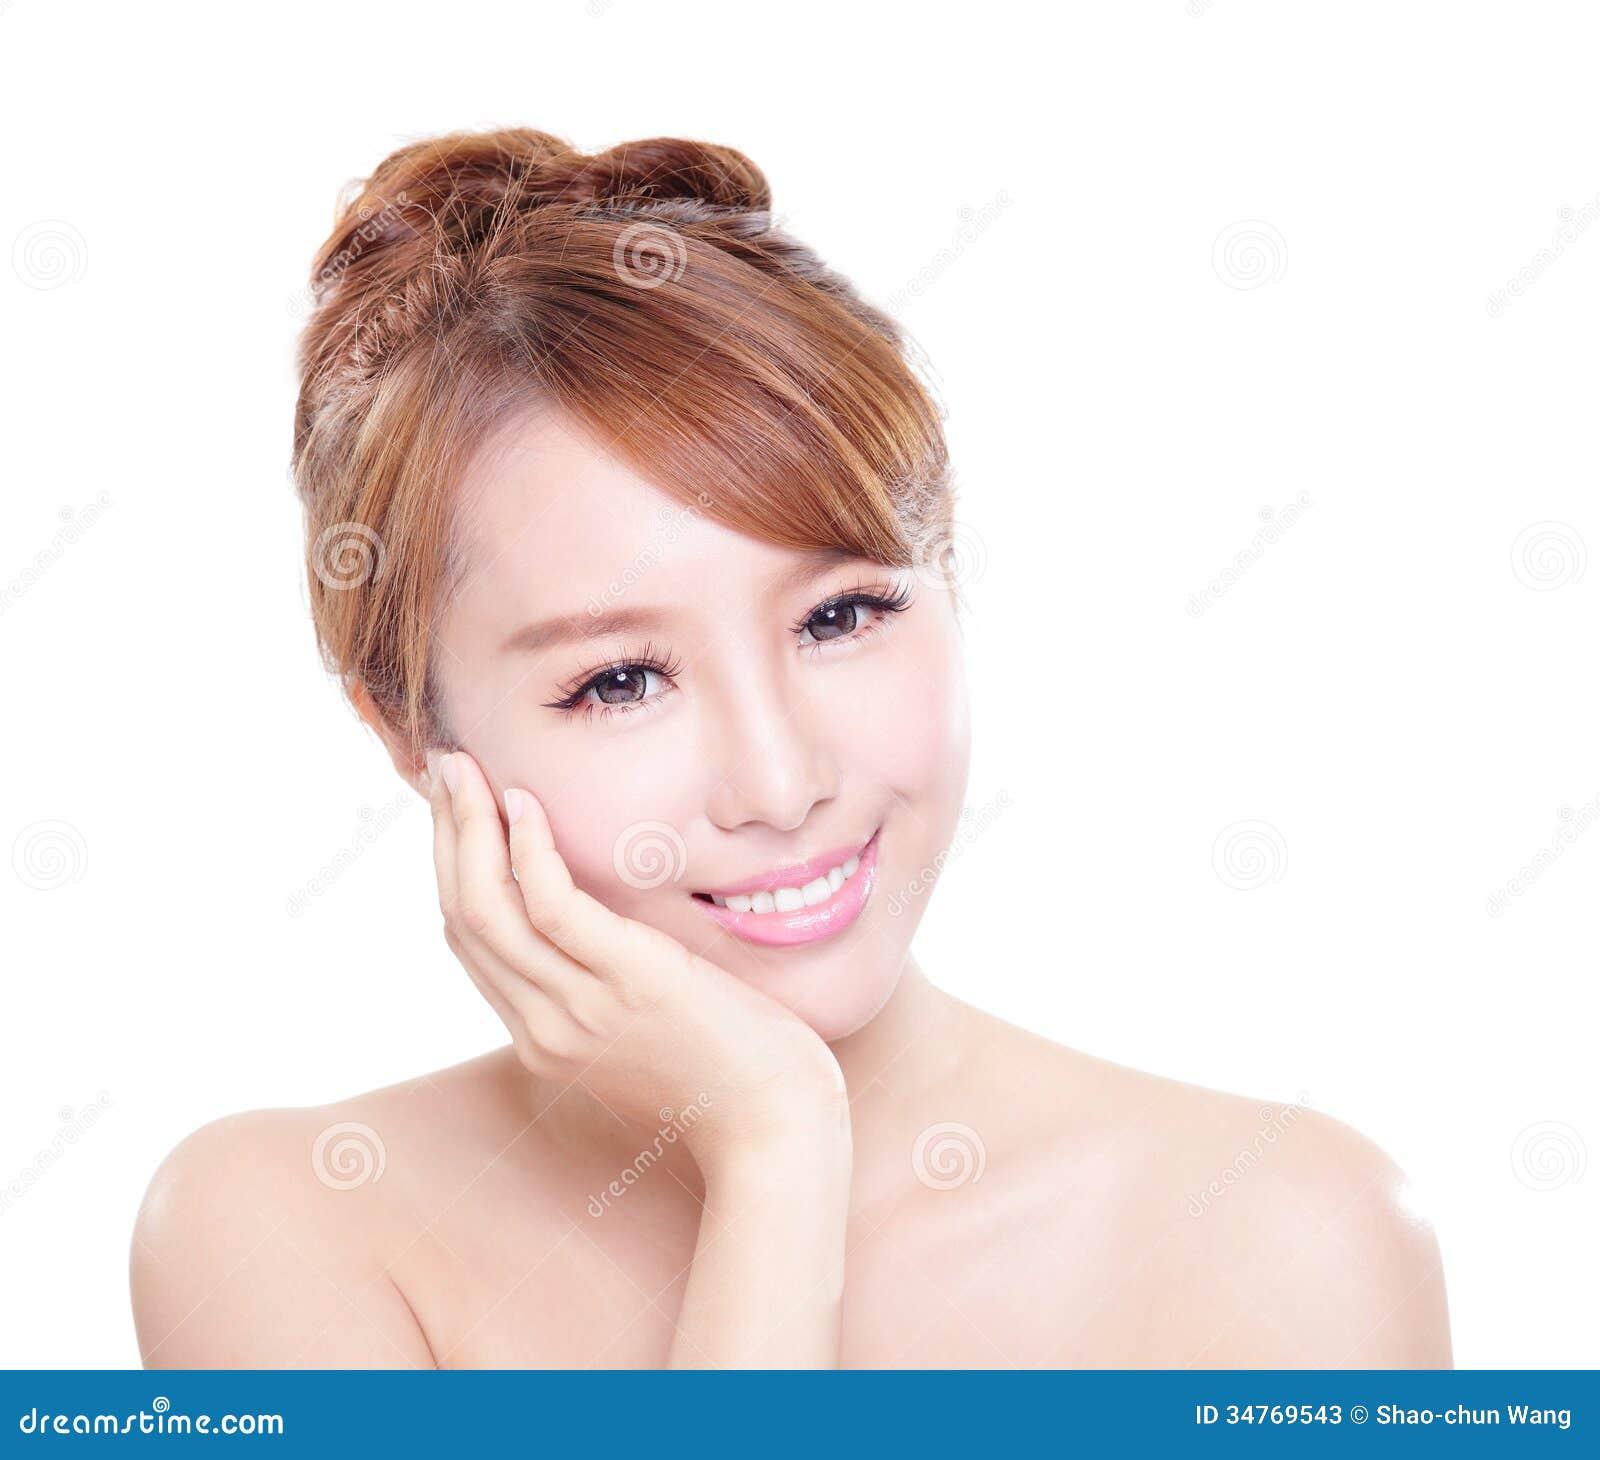 Asian White Face